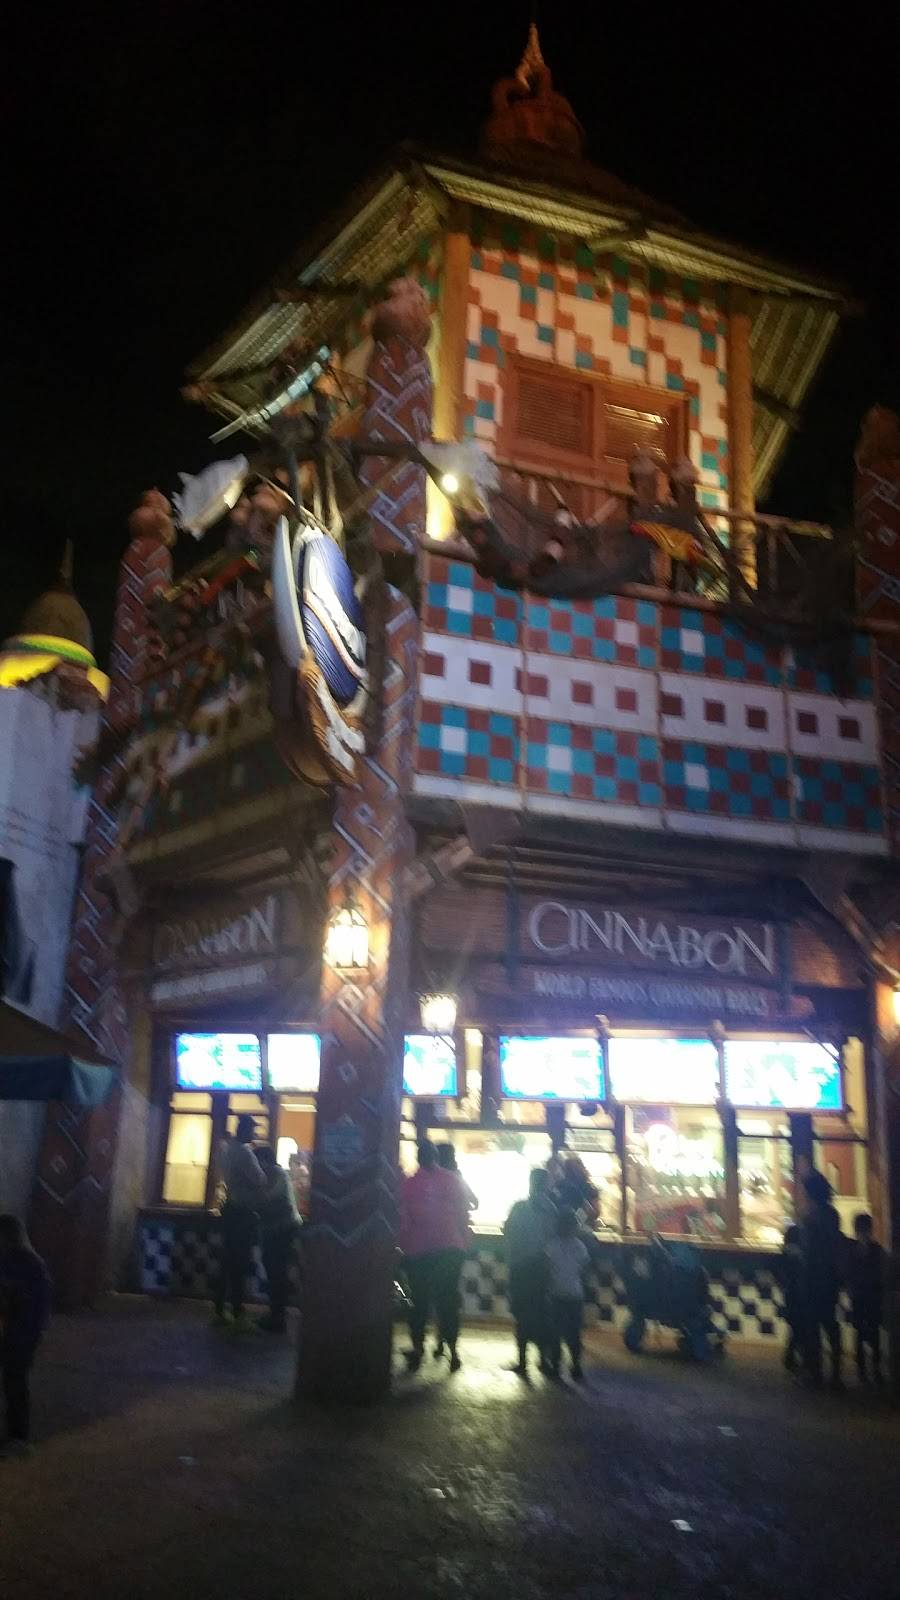 Cinnabon at Islands of Adventure   bakery   6000 Universal Blvd, Orlando, FL 32819, USA   4073638000 OR +1 407-363-8000